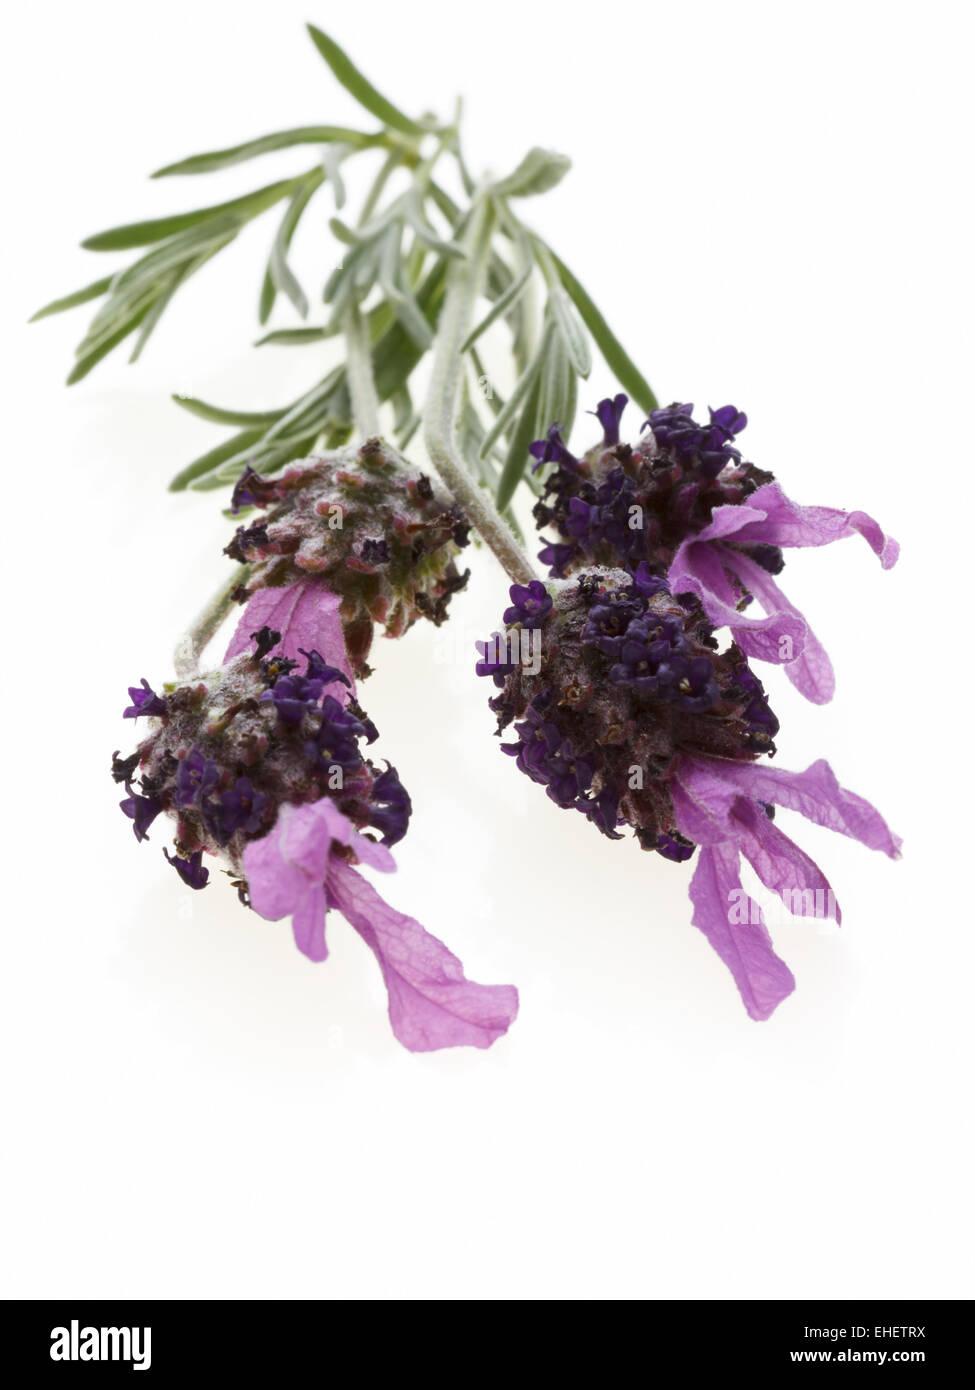 Isolated fresh Lavender - Stock Image